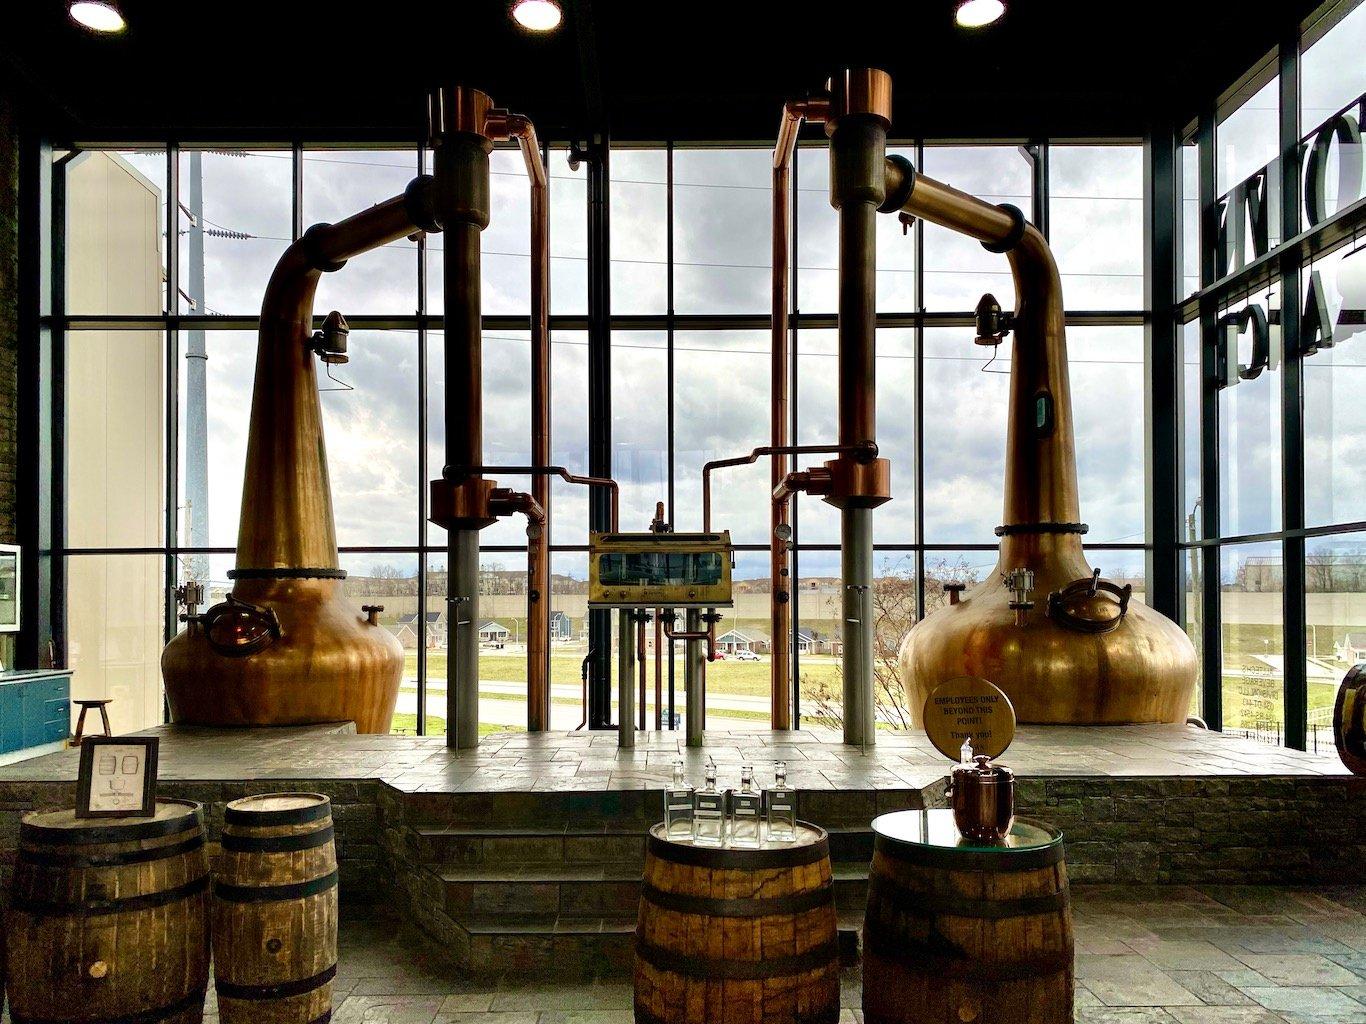 Copper Pot Stills from Forsyth's in Scotland -Lexington Brewing & Distilling Co (Town Branch Distillery)